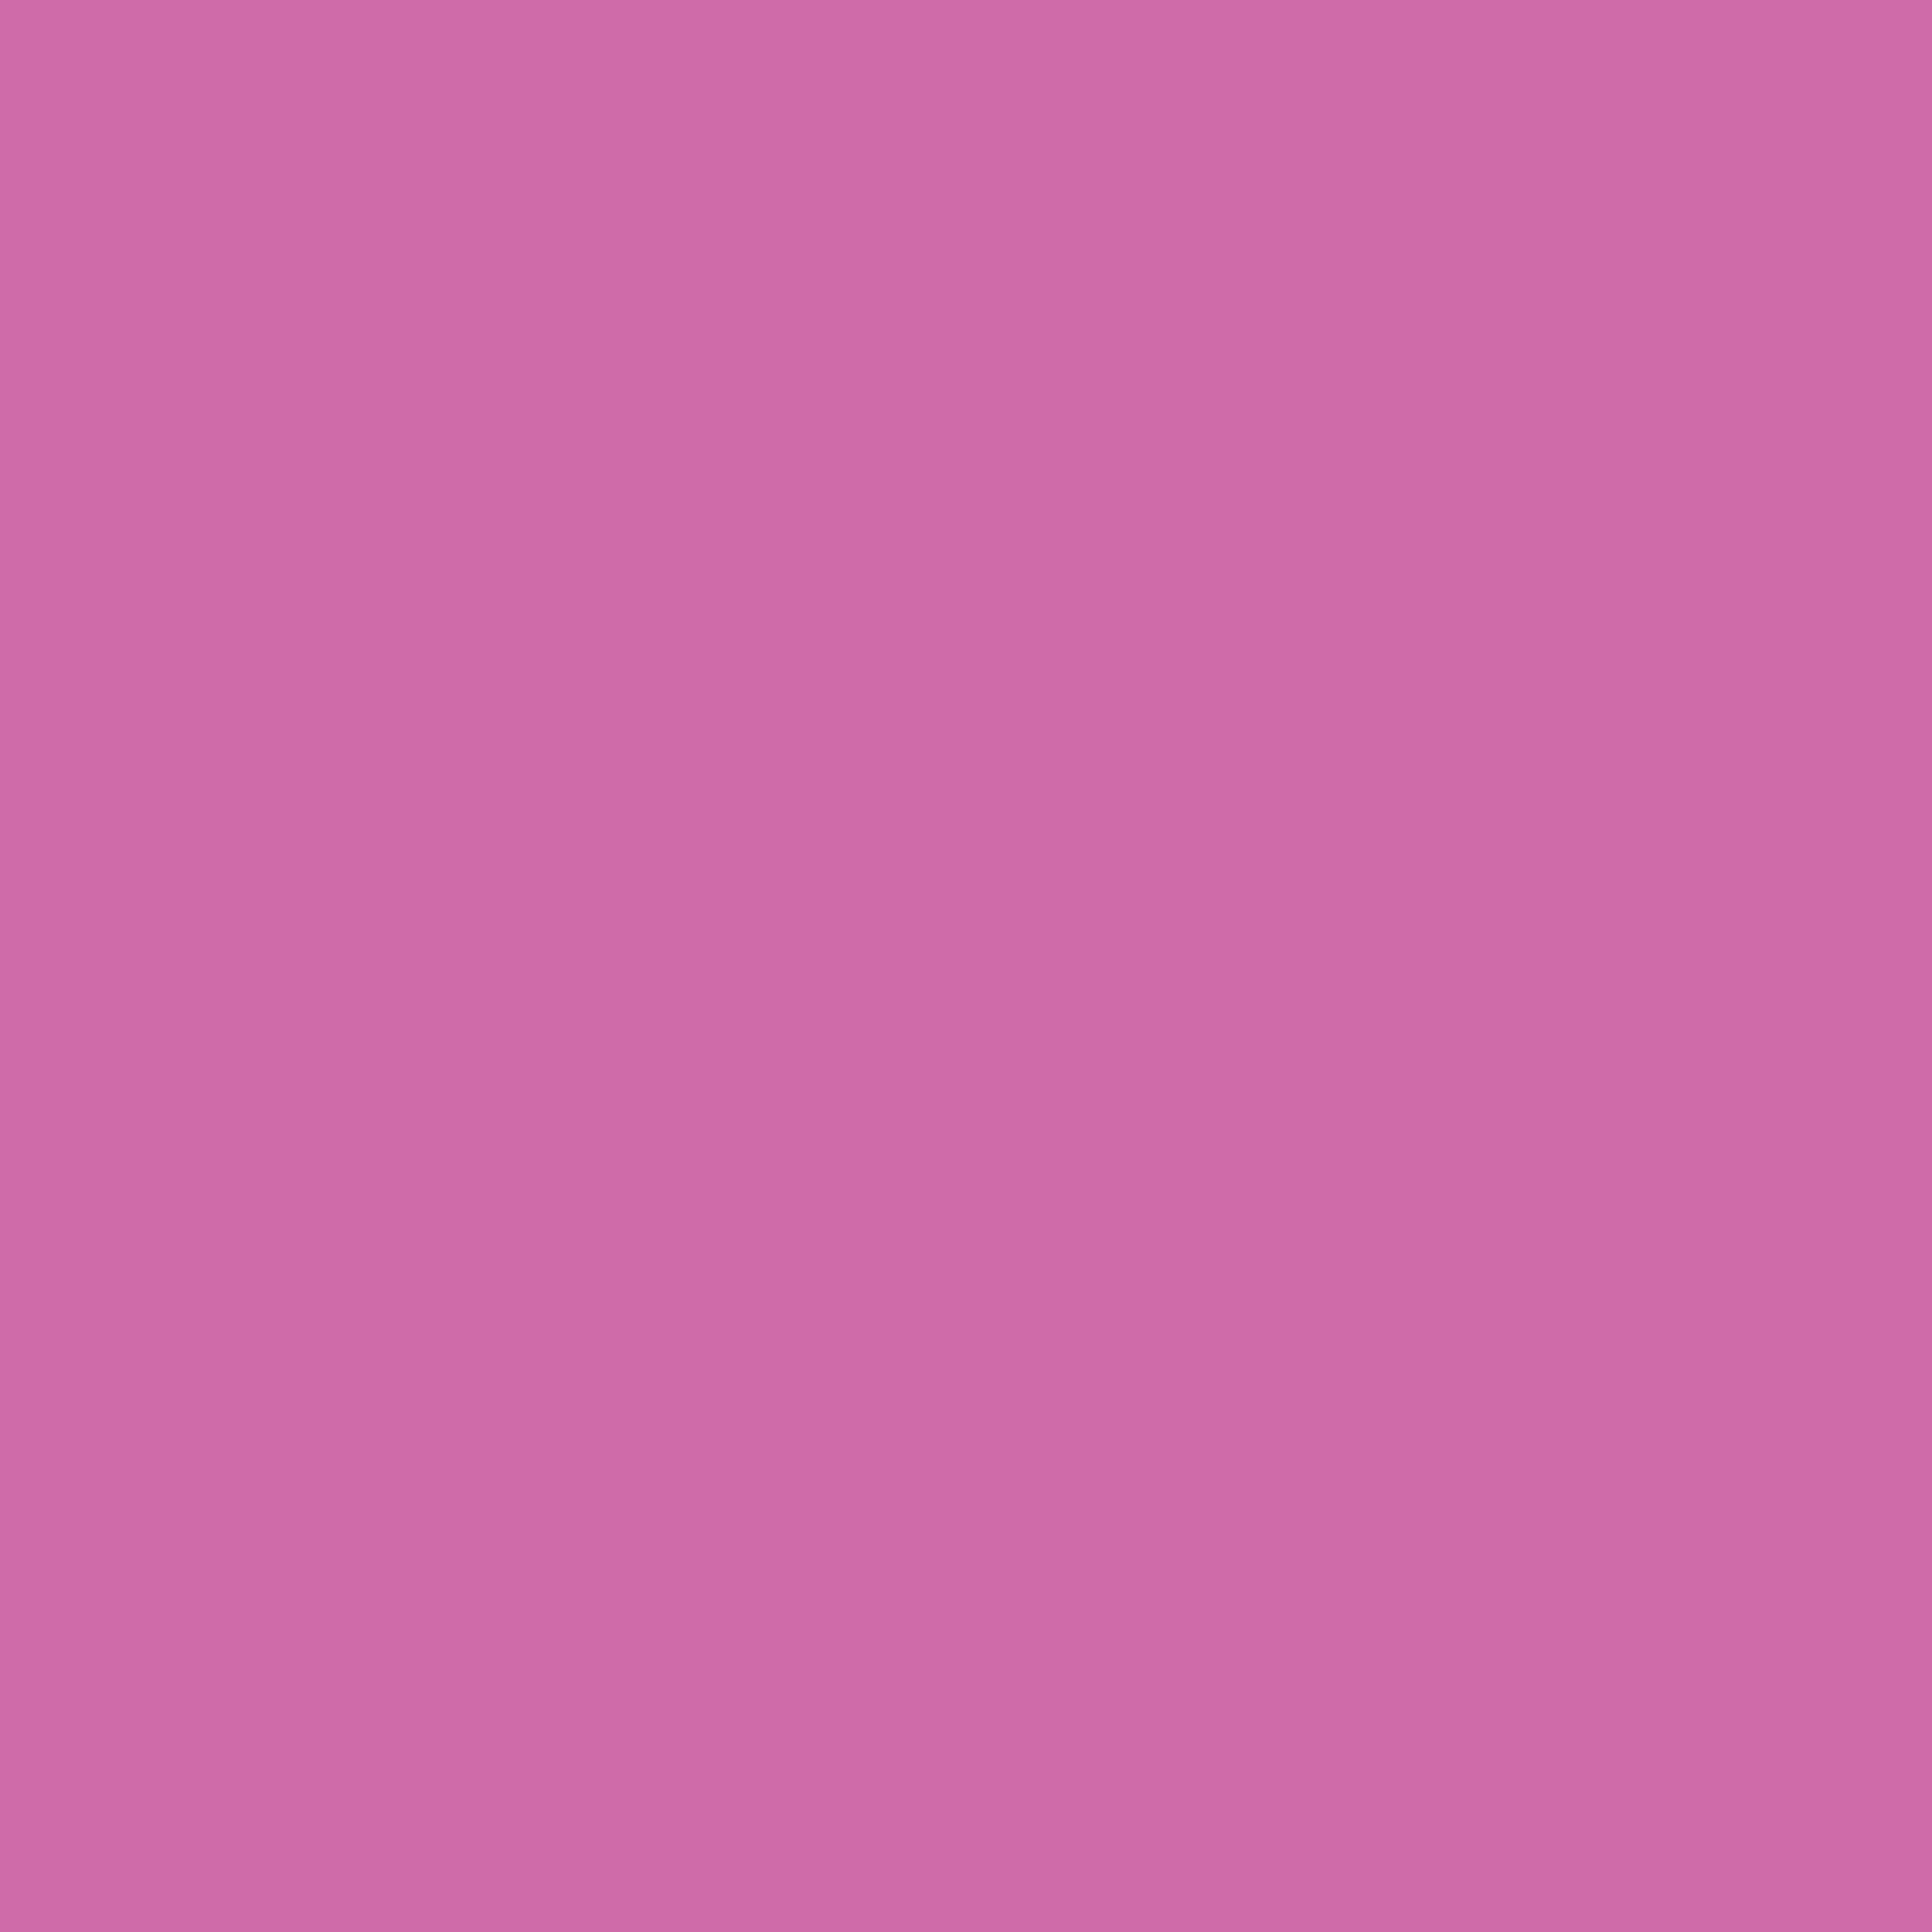 2732x2732 Super Pink Solid Color Background